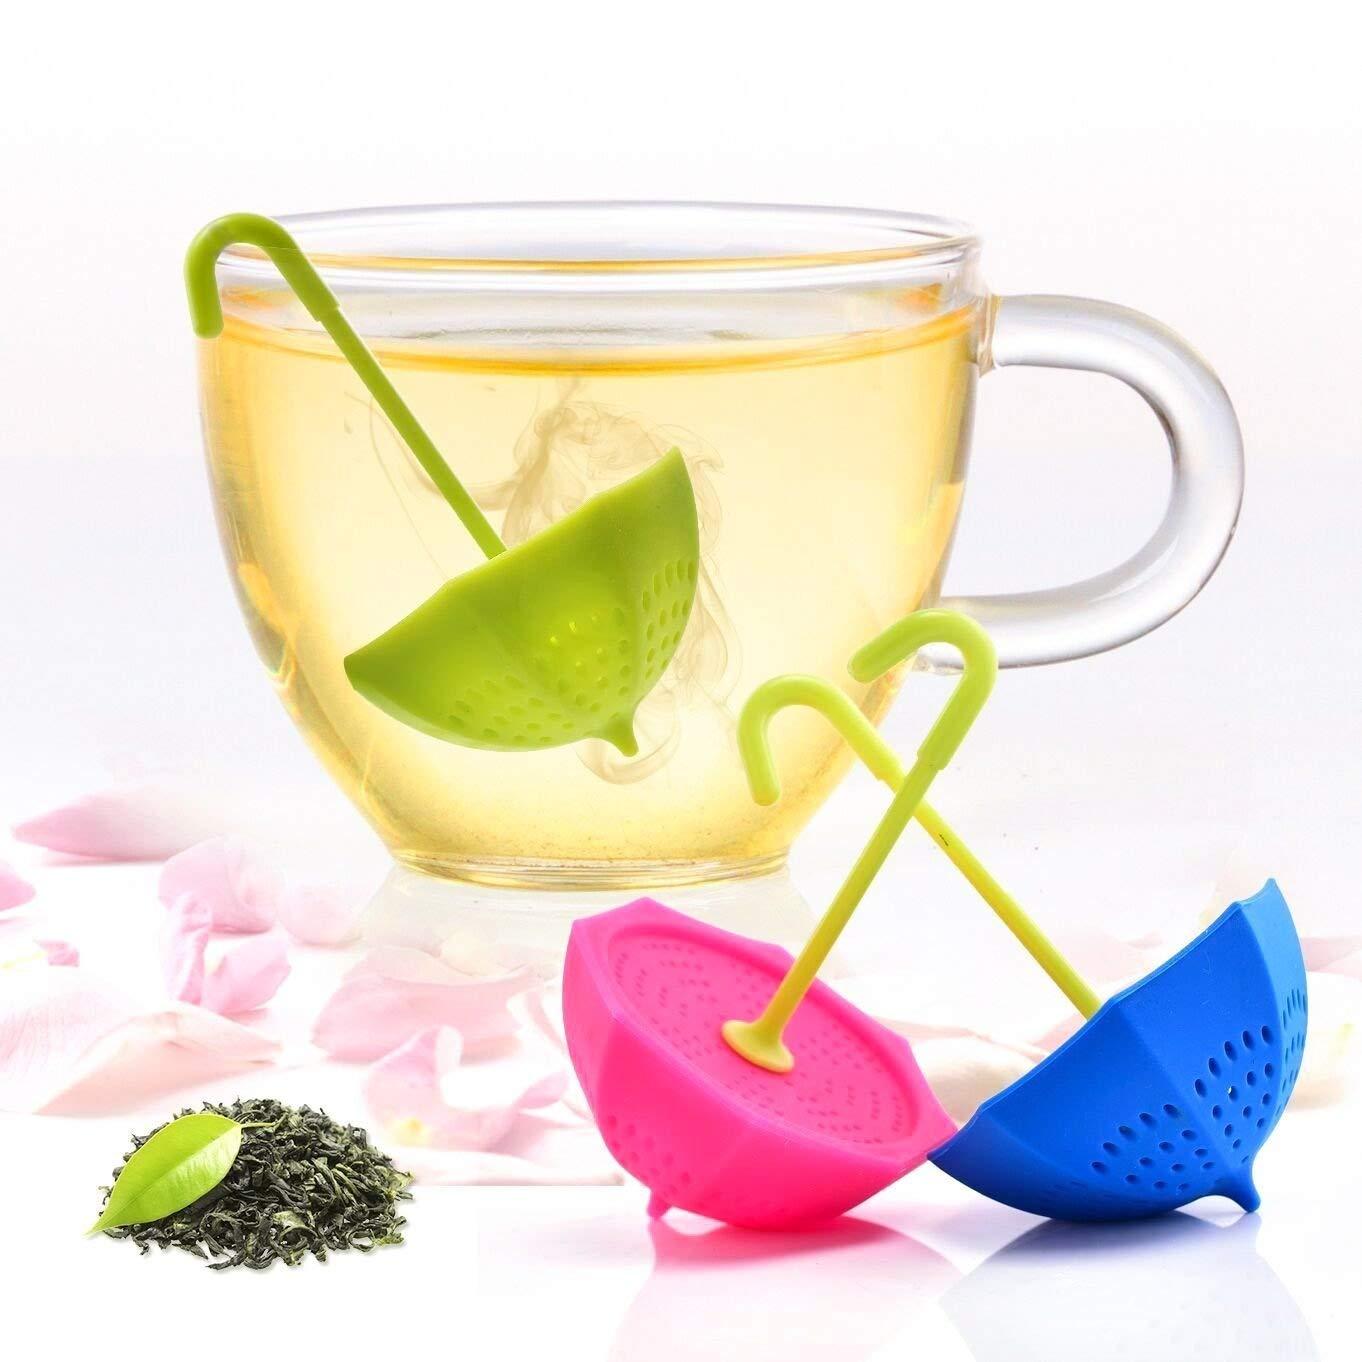 Tea Bag Infuser-Senbowe™ 3 Pack Colorful Genuine Premium Silicone Umbrella Reusable Tea Ball Infuser Strainer Steeper Set for Loose Leaves & Herbal Teas-Great Gift for Tea Lovers by senbowe